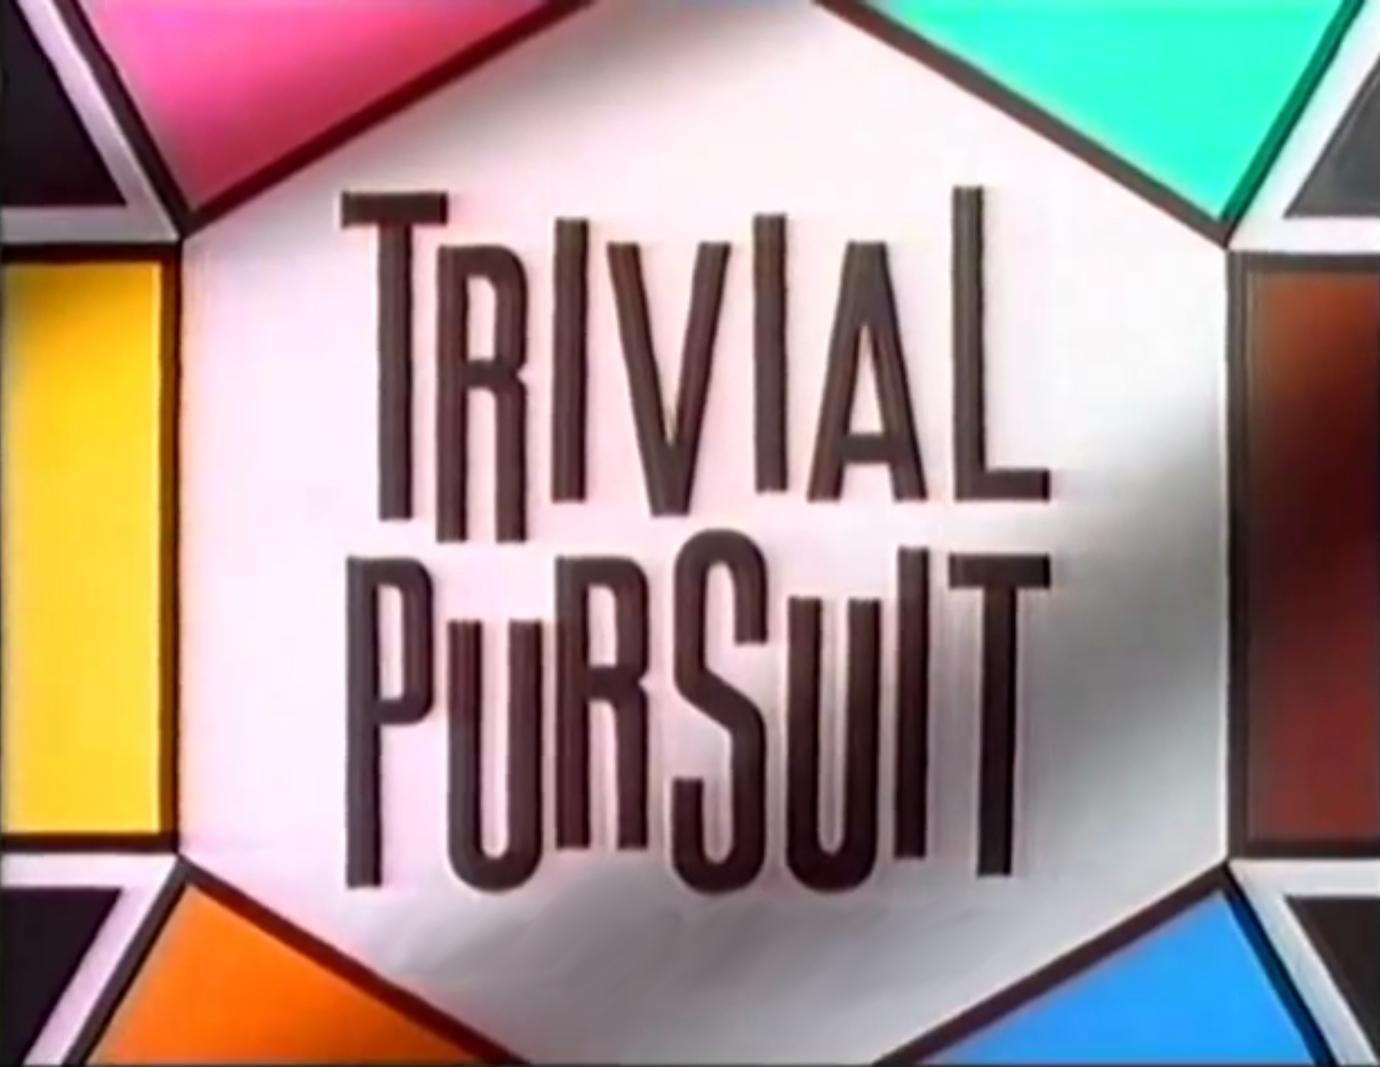 Trivial Pursuit (UK game show)